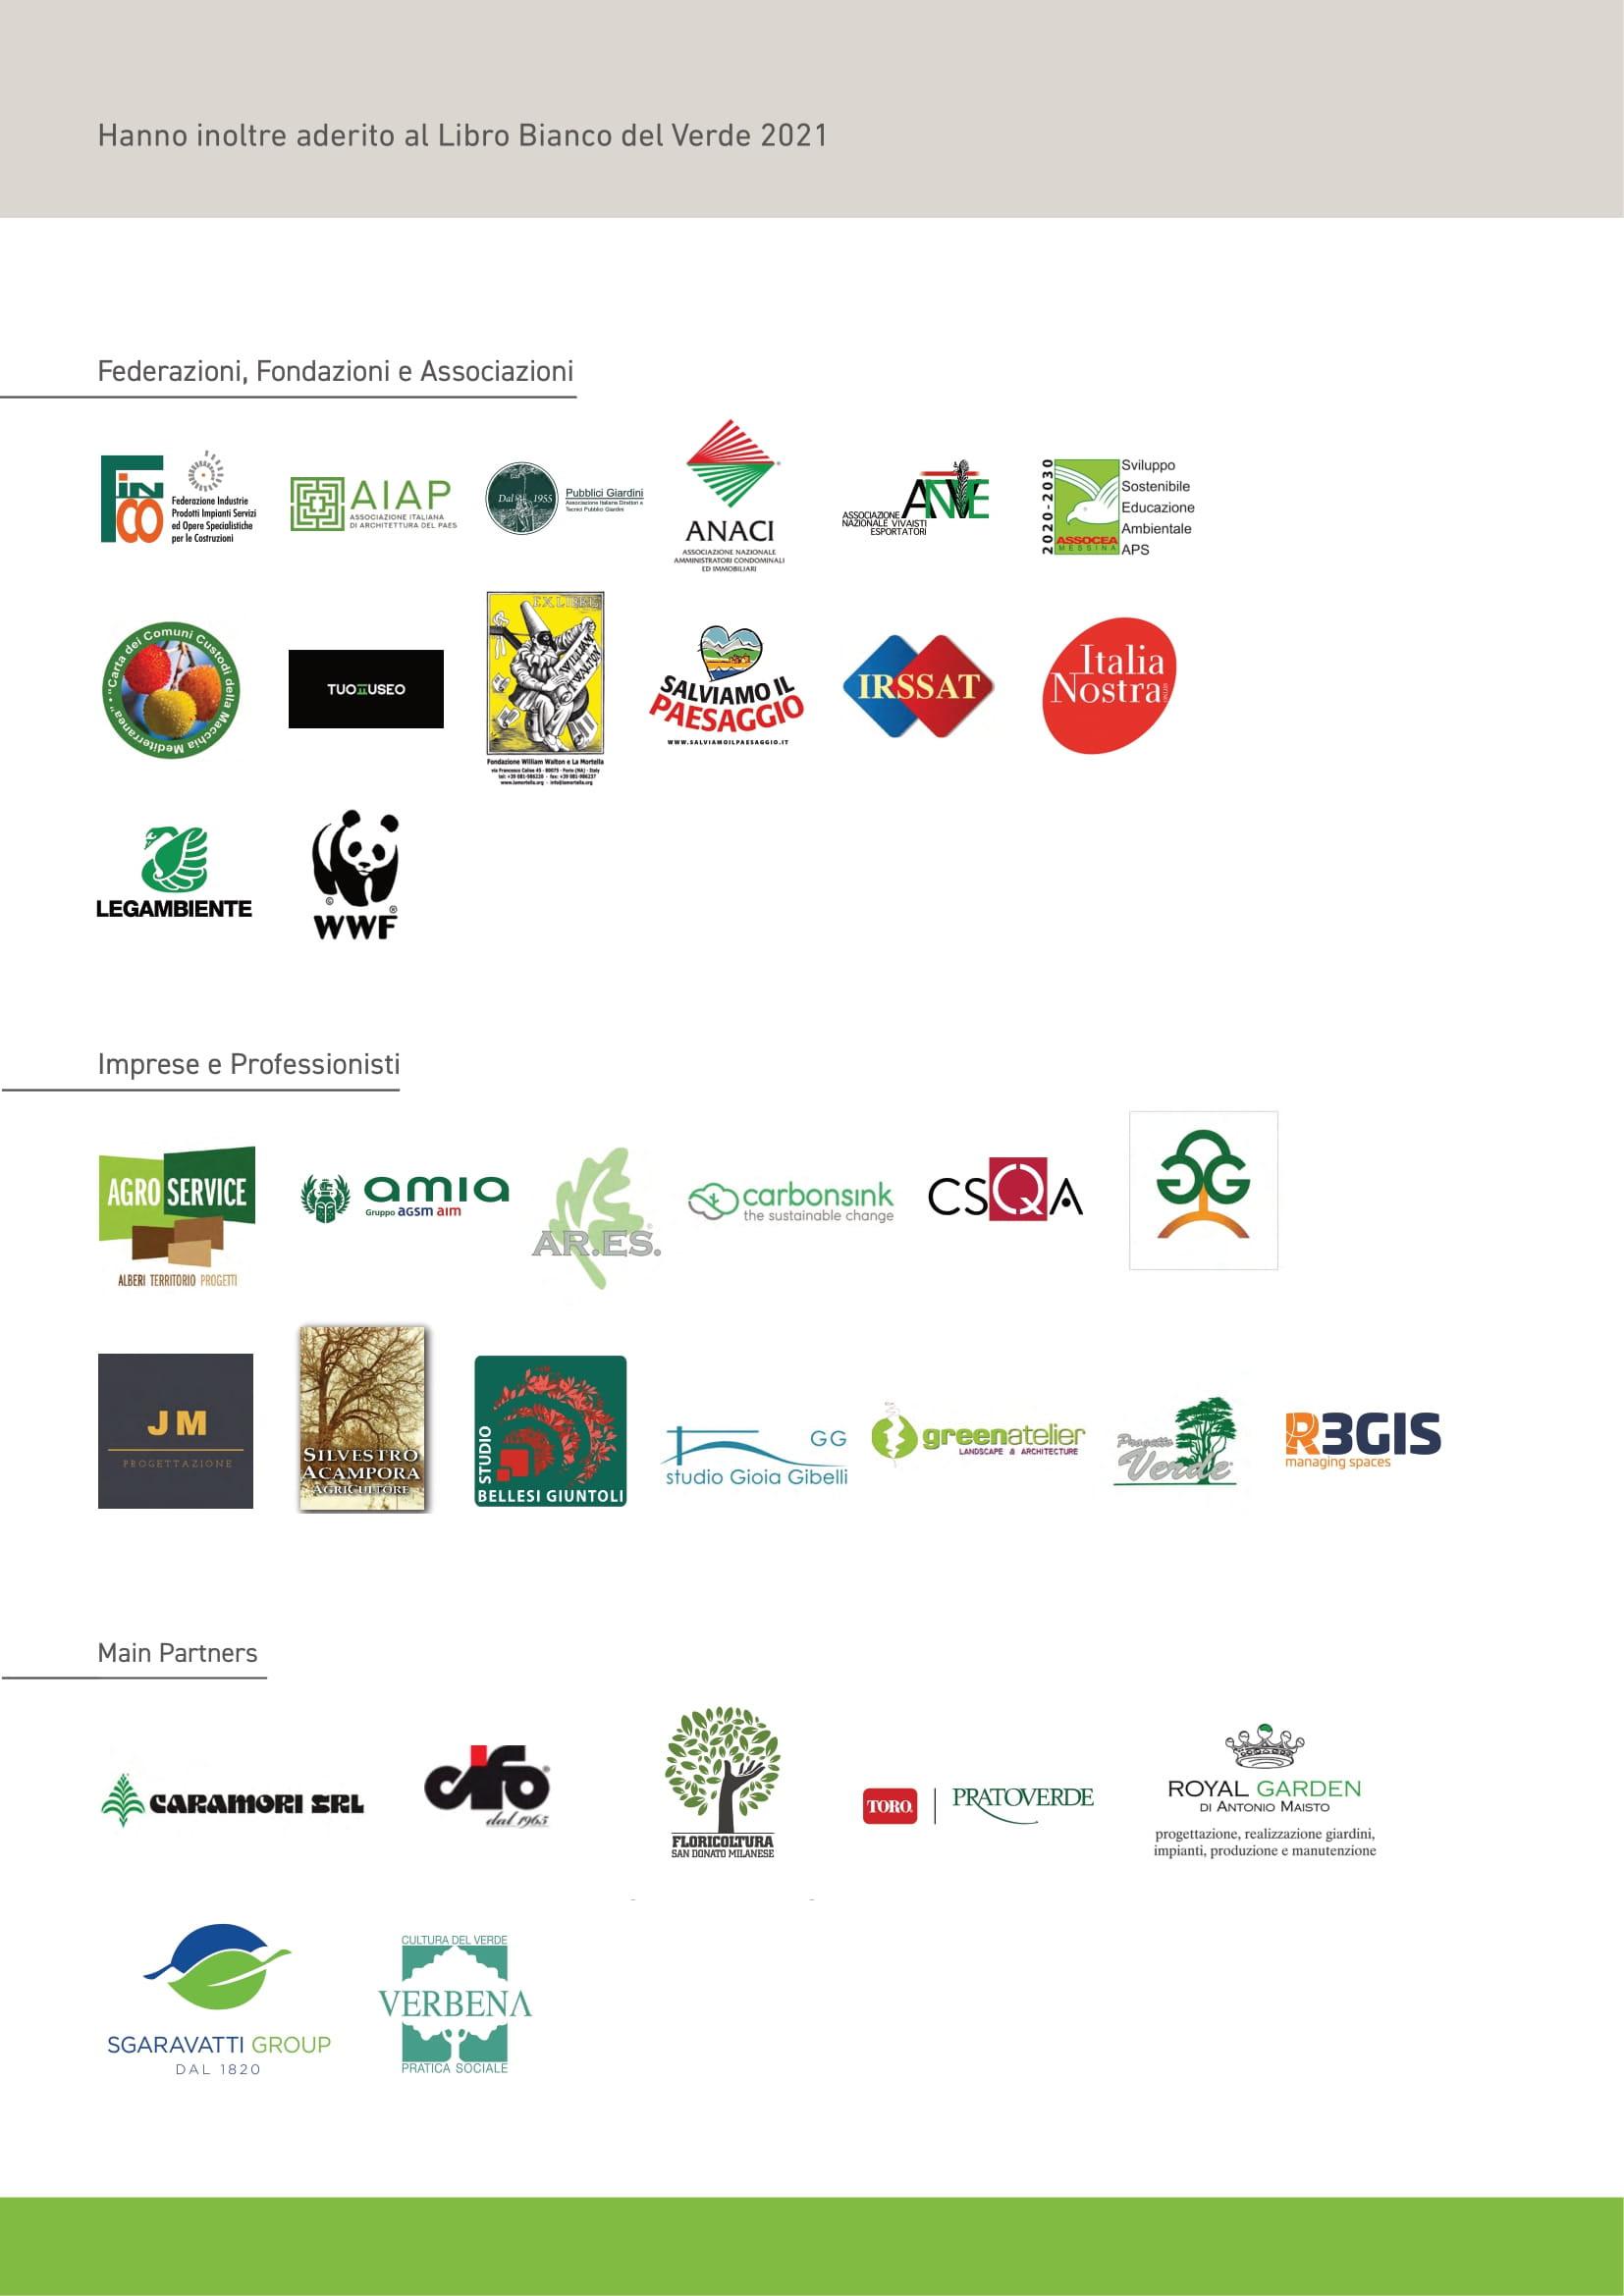 Libro Bianco del Verde 12 ottobre 2021 - 1.jpg